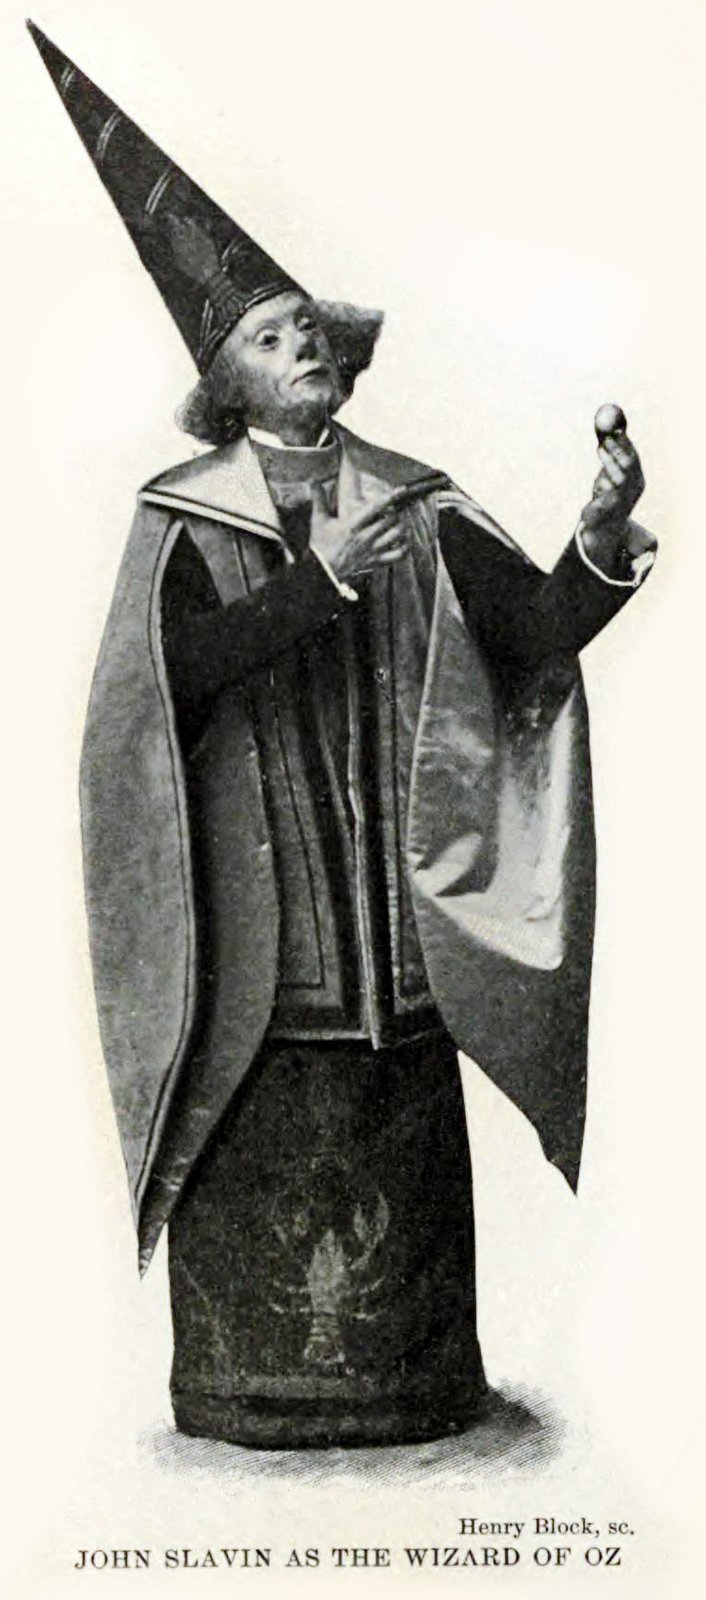 John Slavin as the Wizard of Oz - c1904